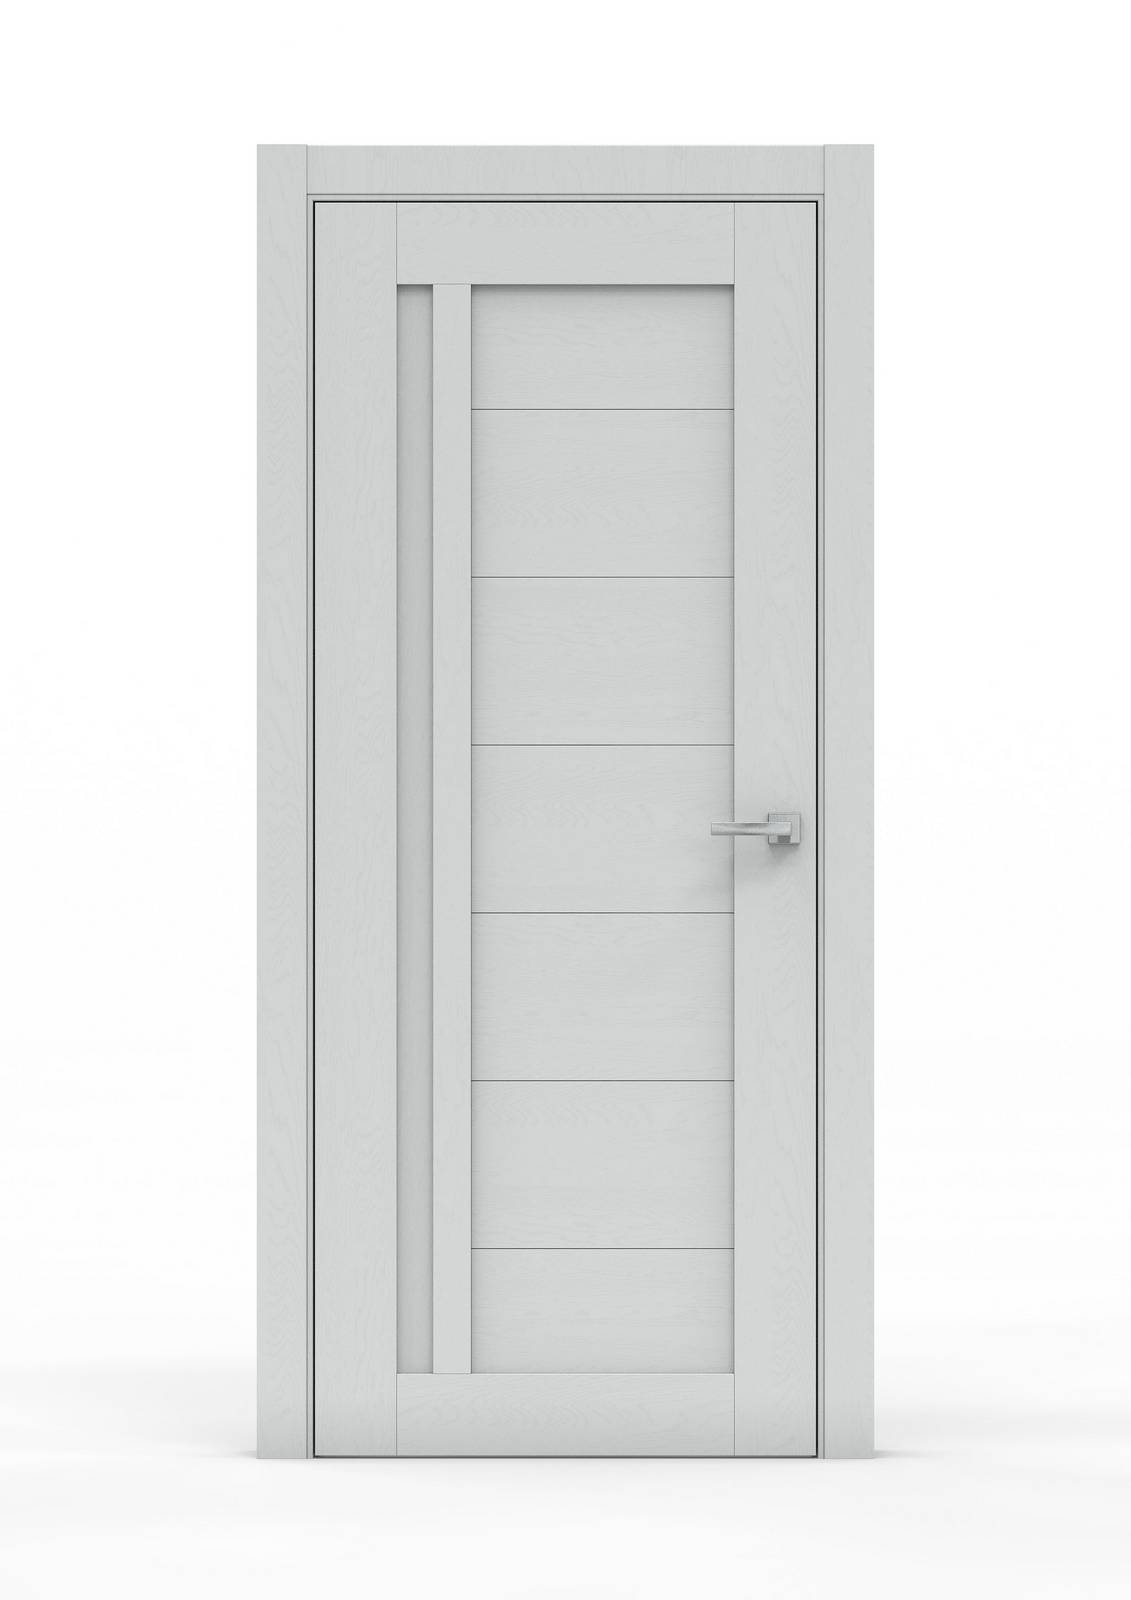 Межкомнатная дверь - 0693. Цвет - Ясень Серый